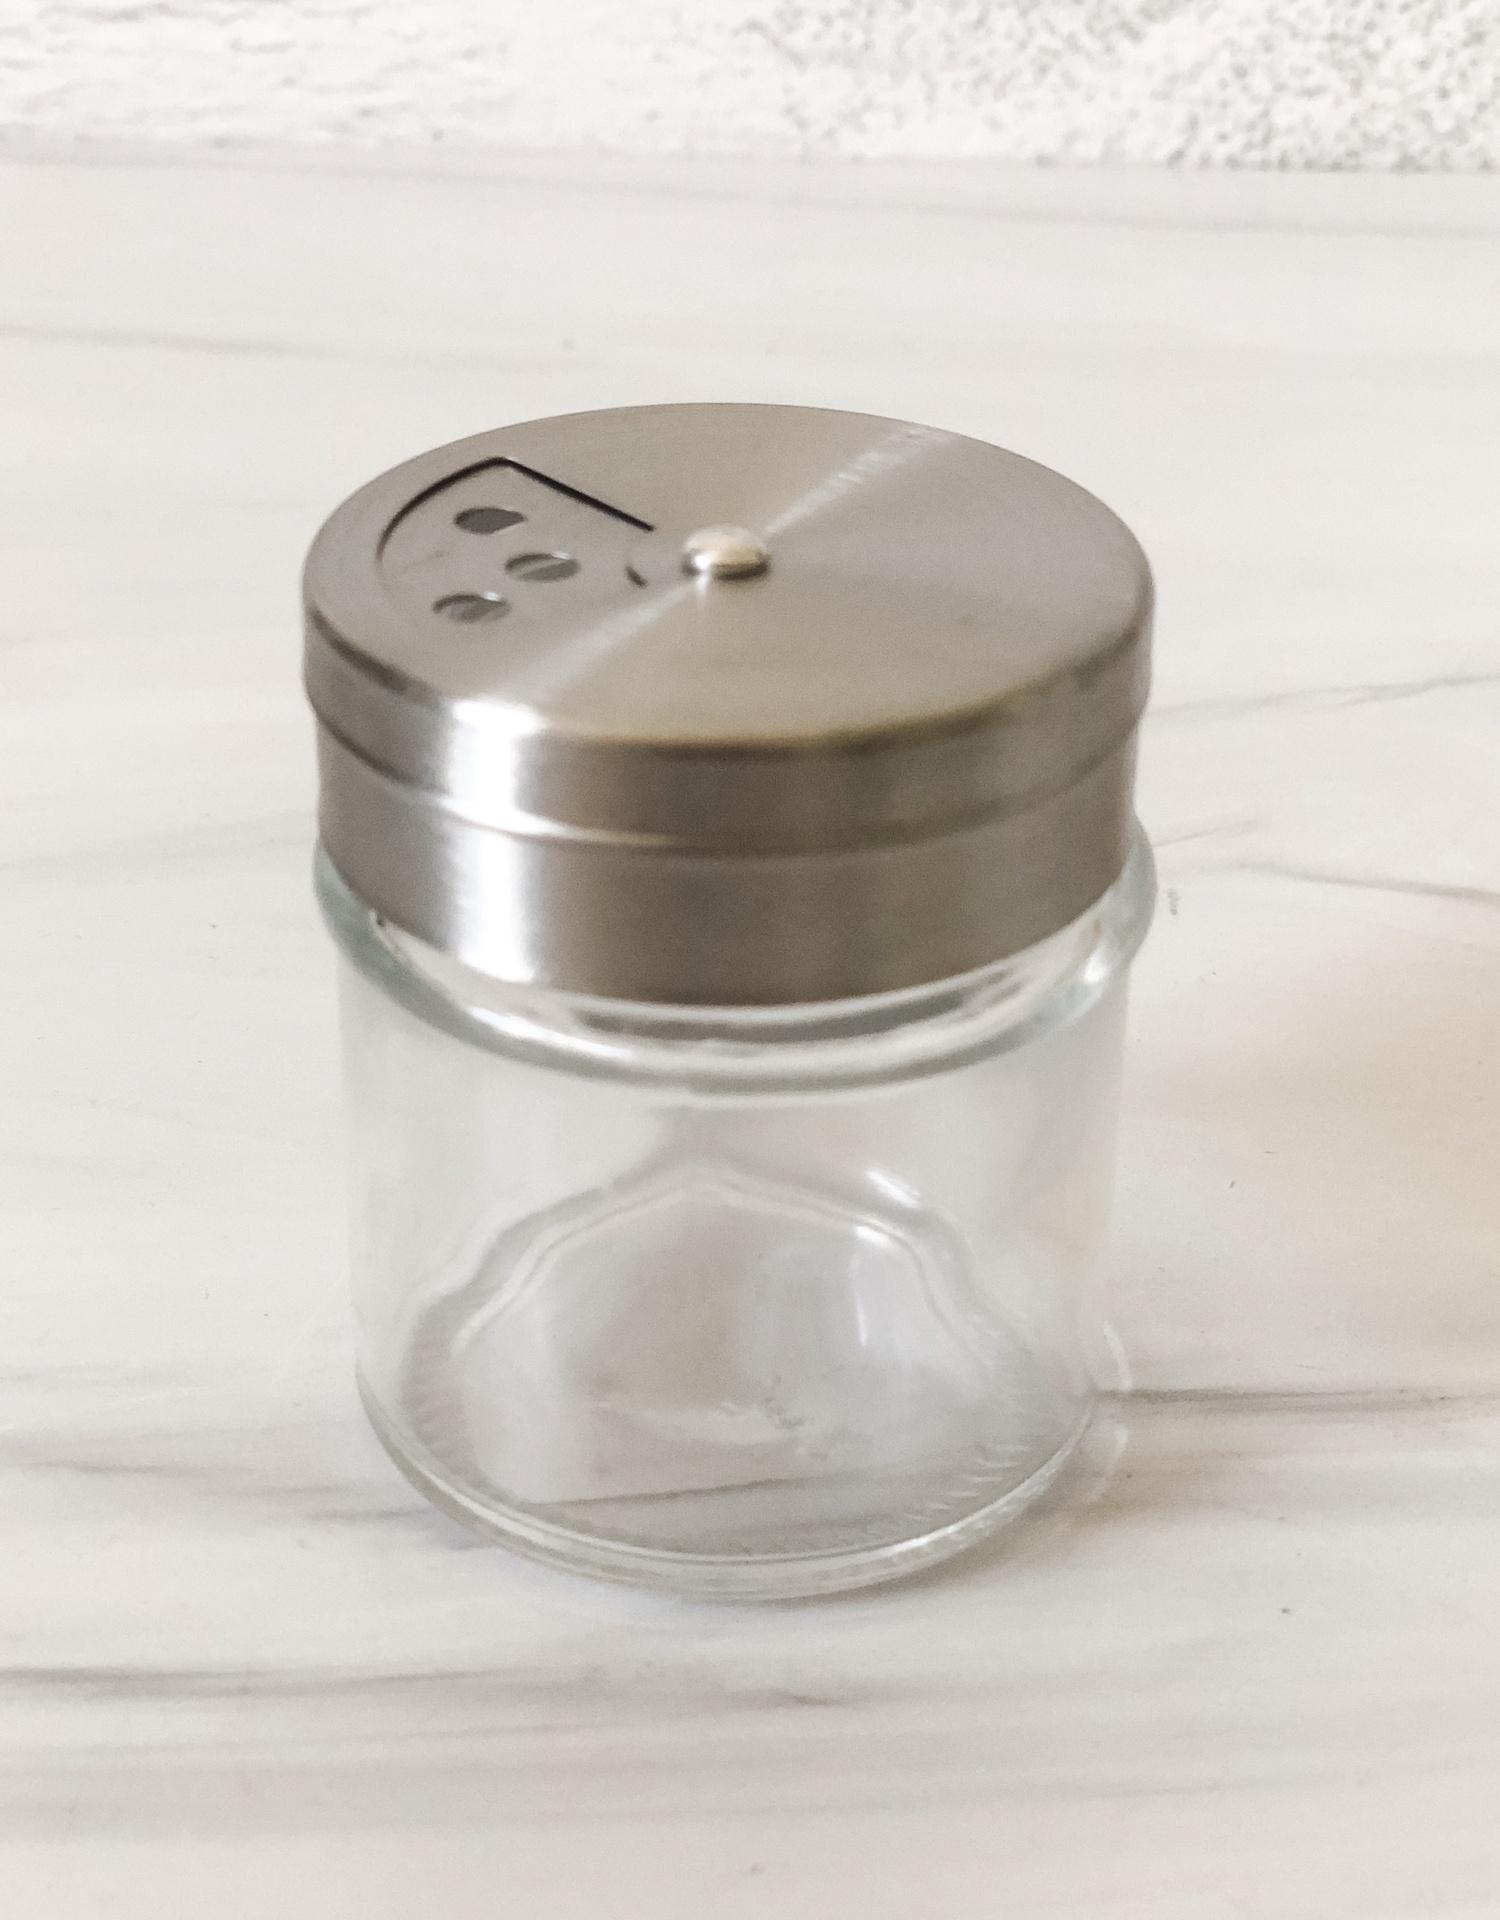 Spice Shaker, 1.5oz